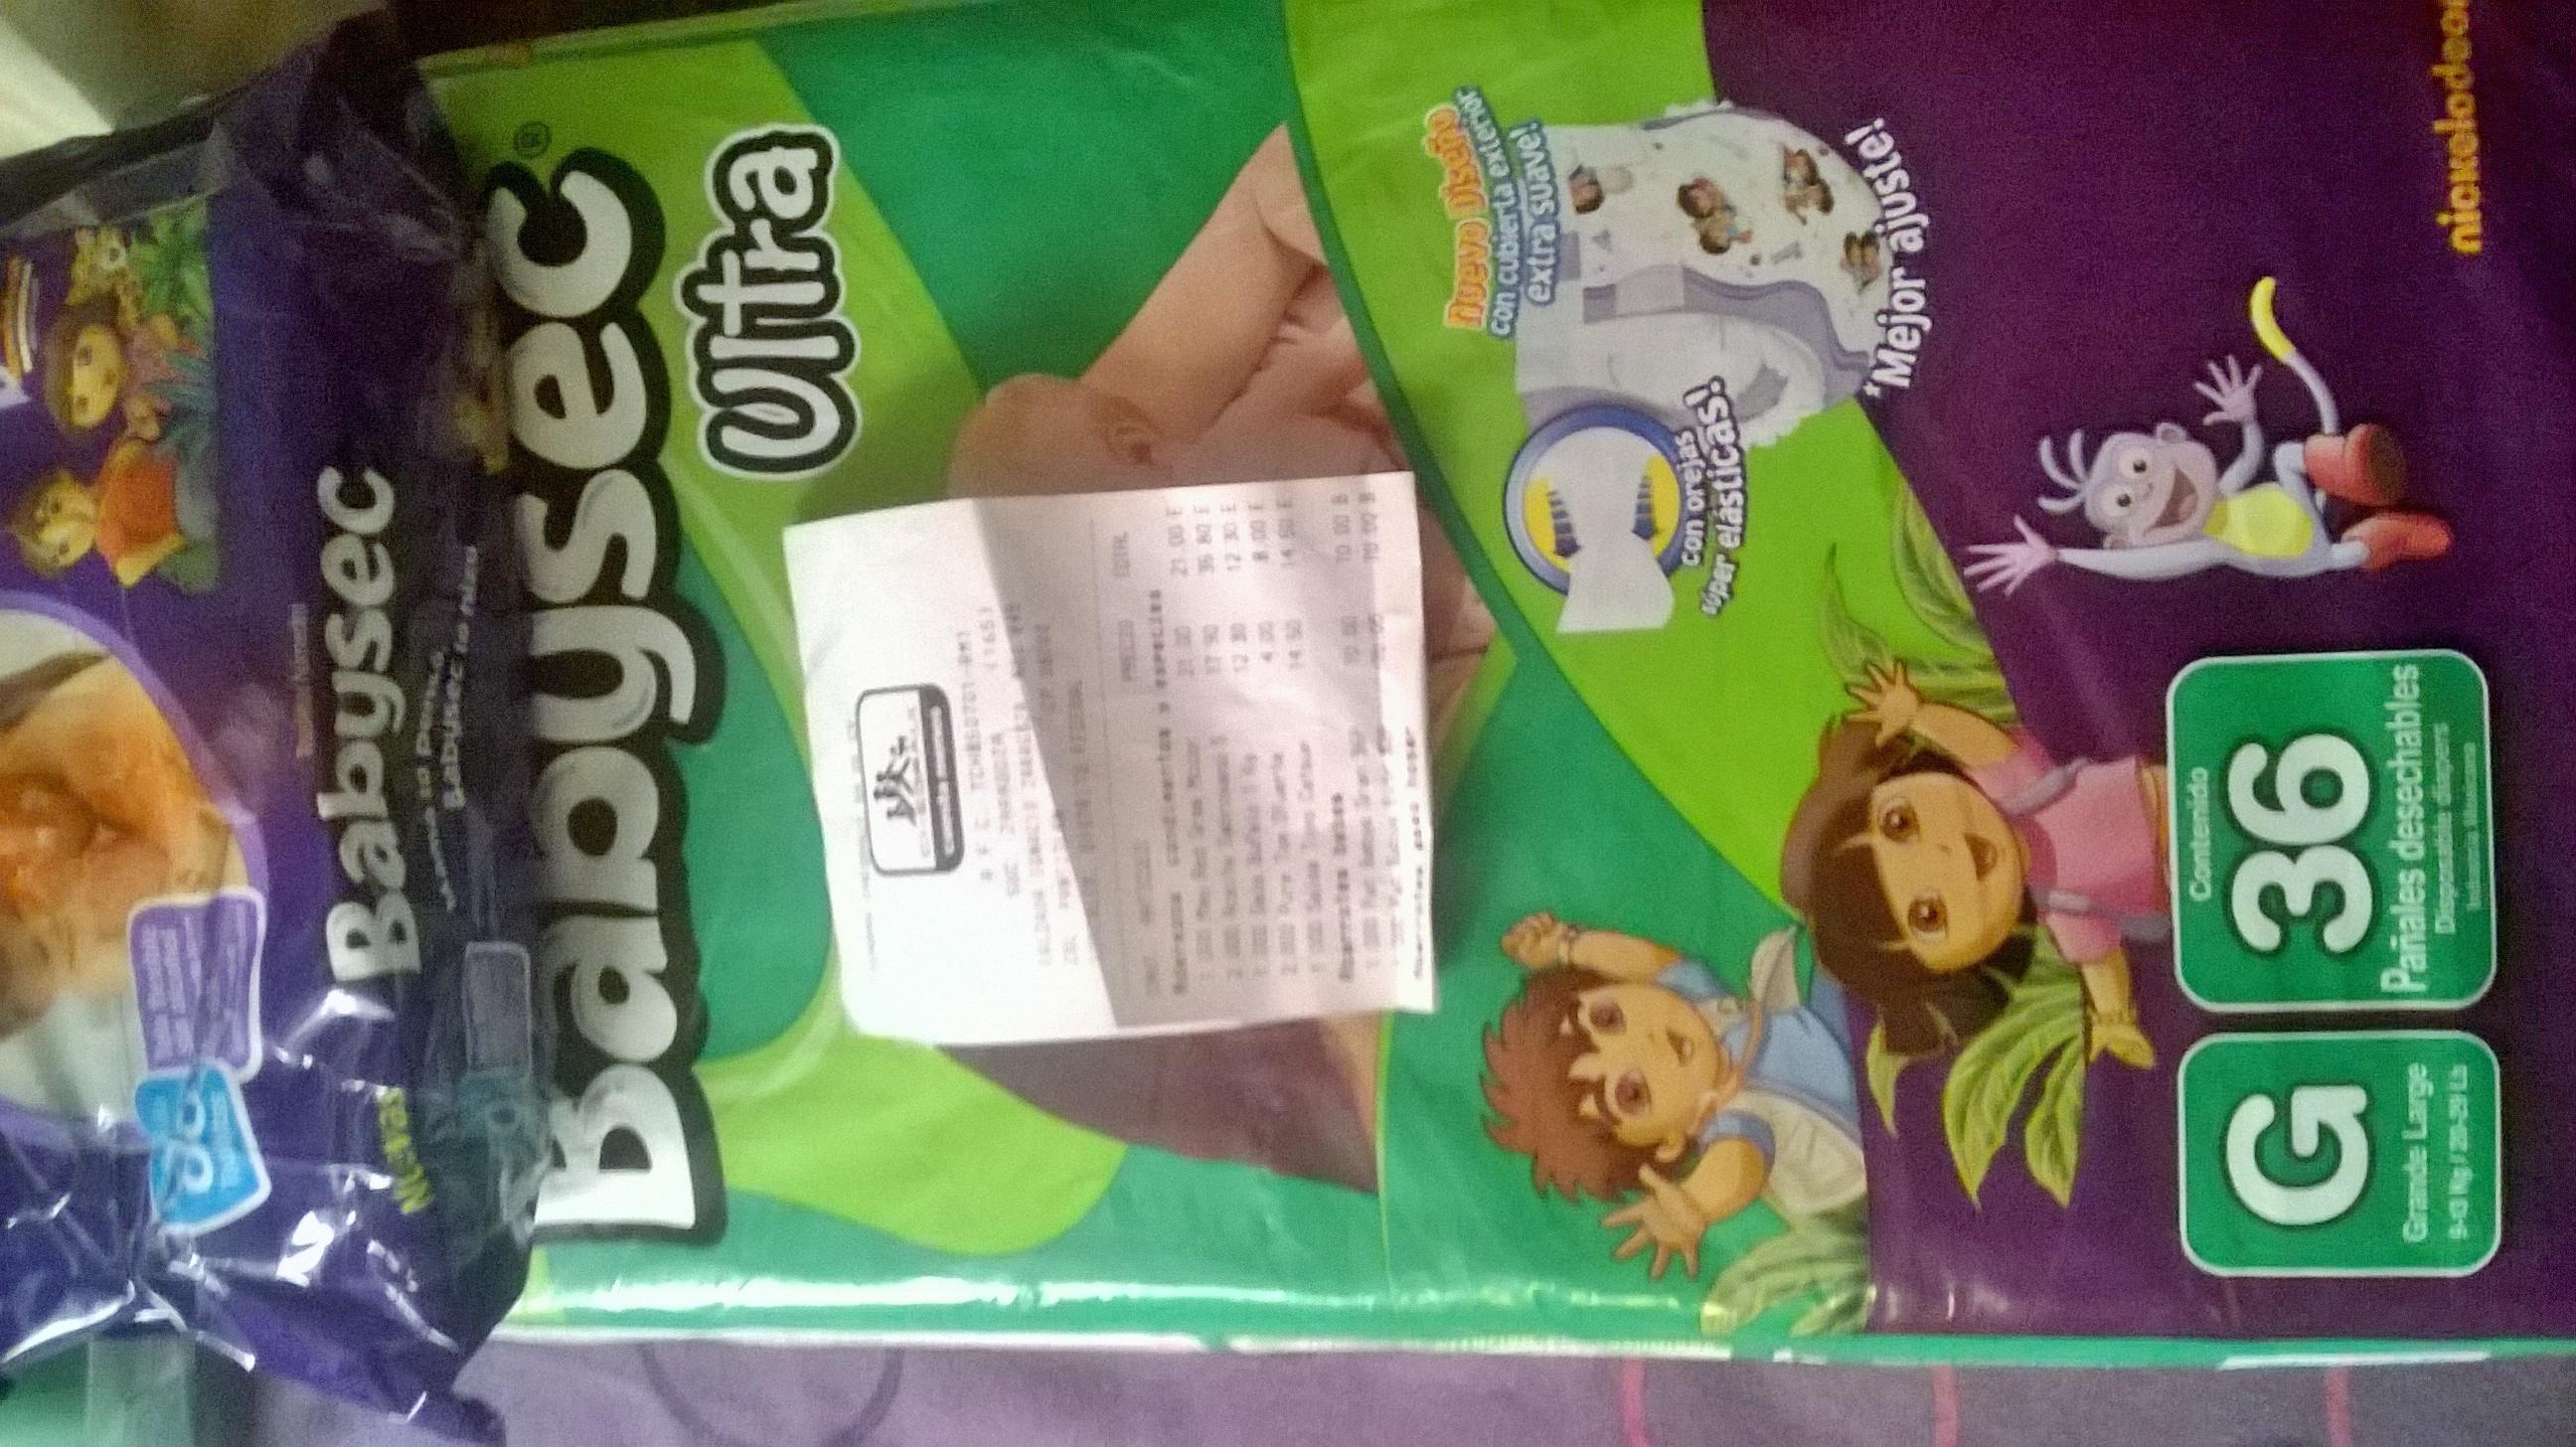 Chedraui Zaragoza D,F: 36 pañales Babysec + toallitas